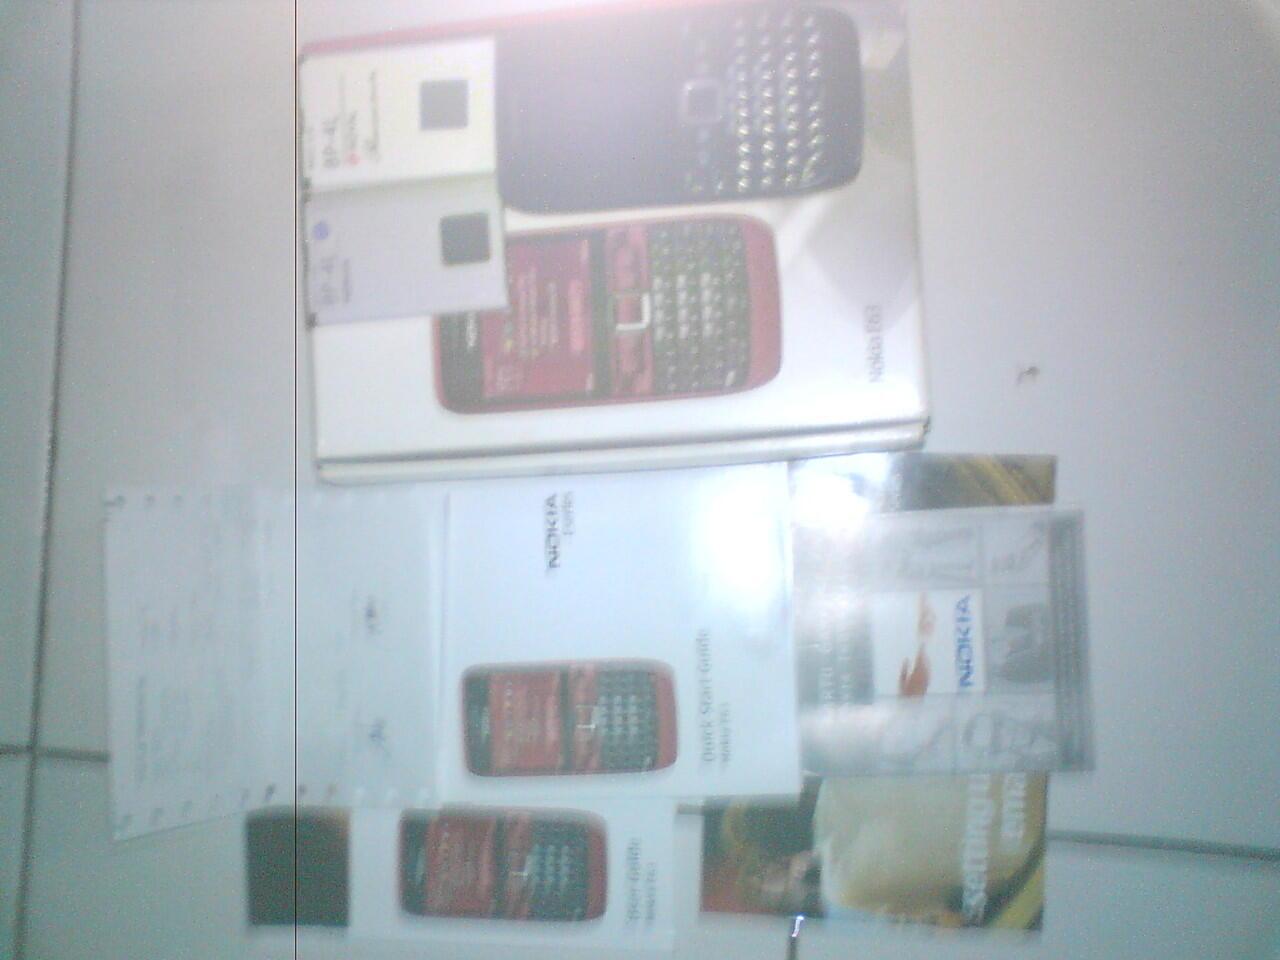 Nokia E63 Murah (Semarang)